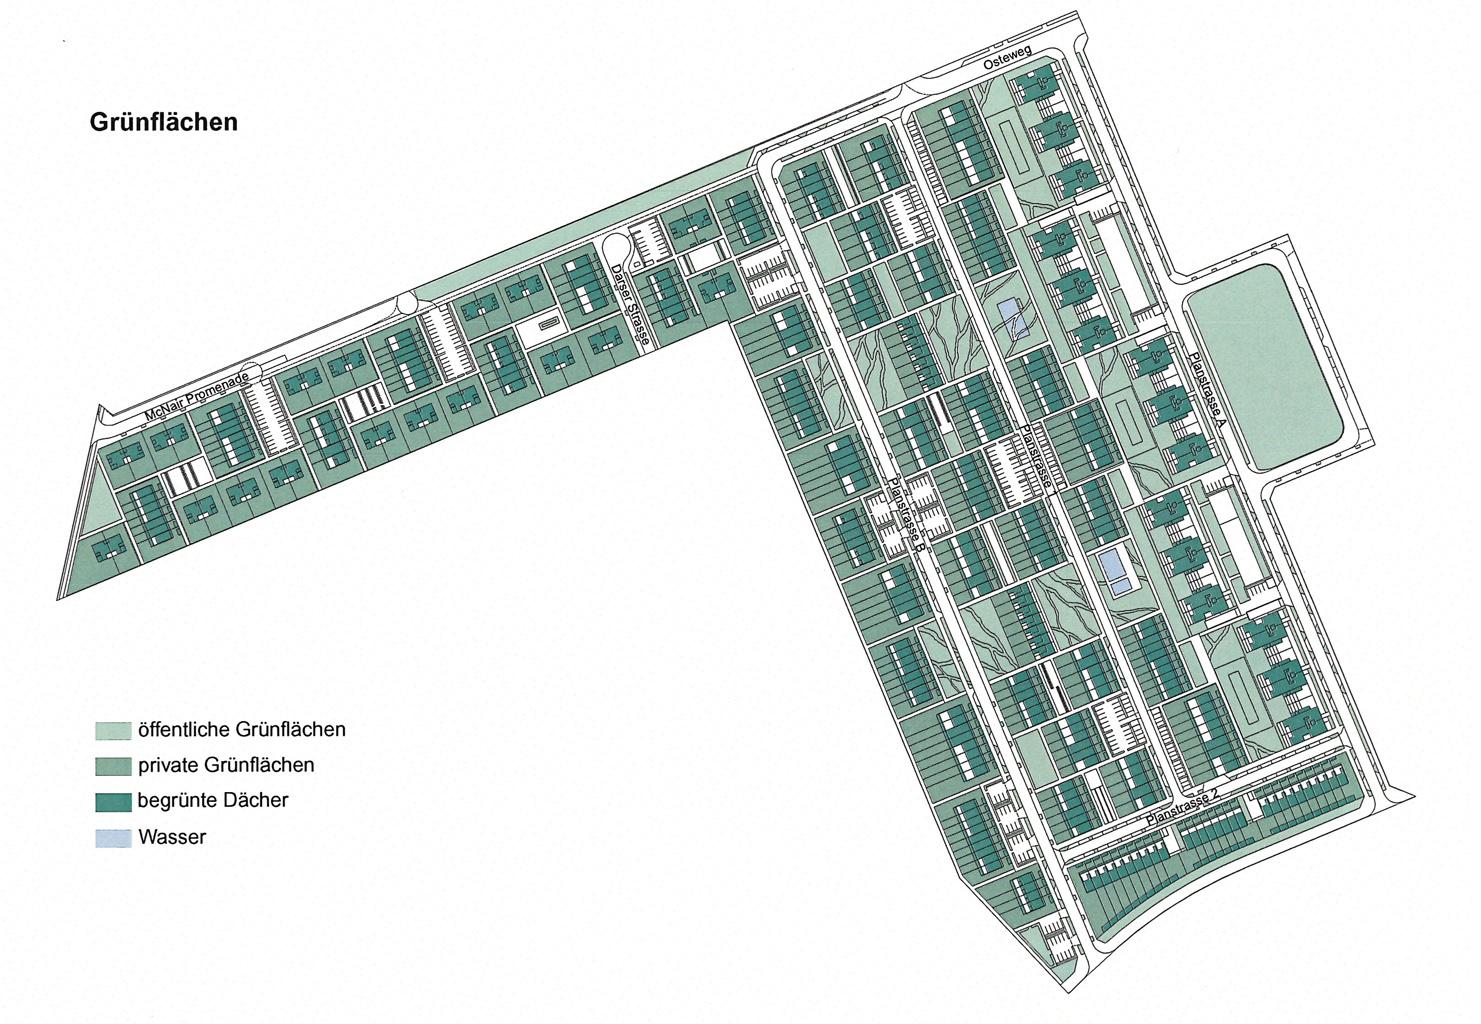 Schema - Grünflächen.jpg